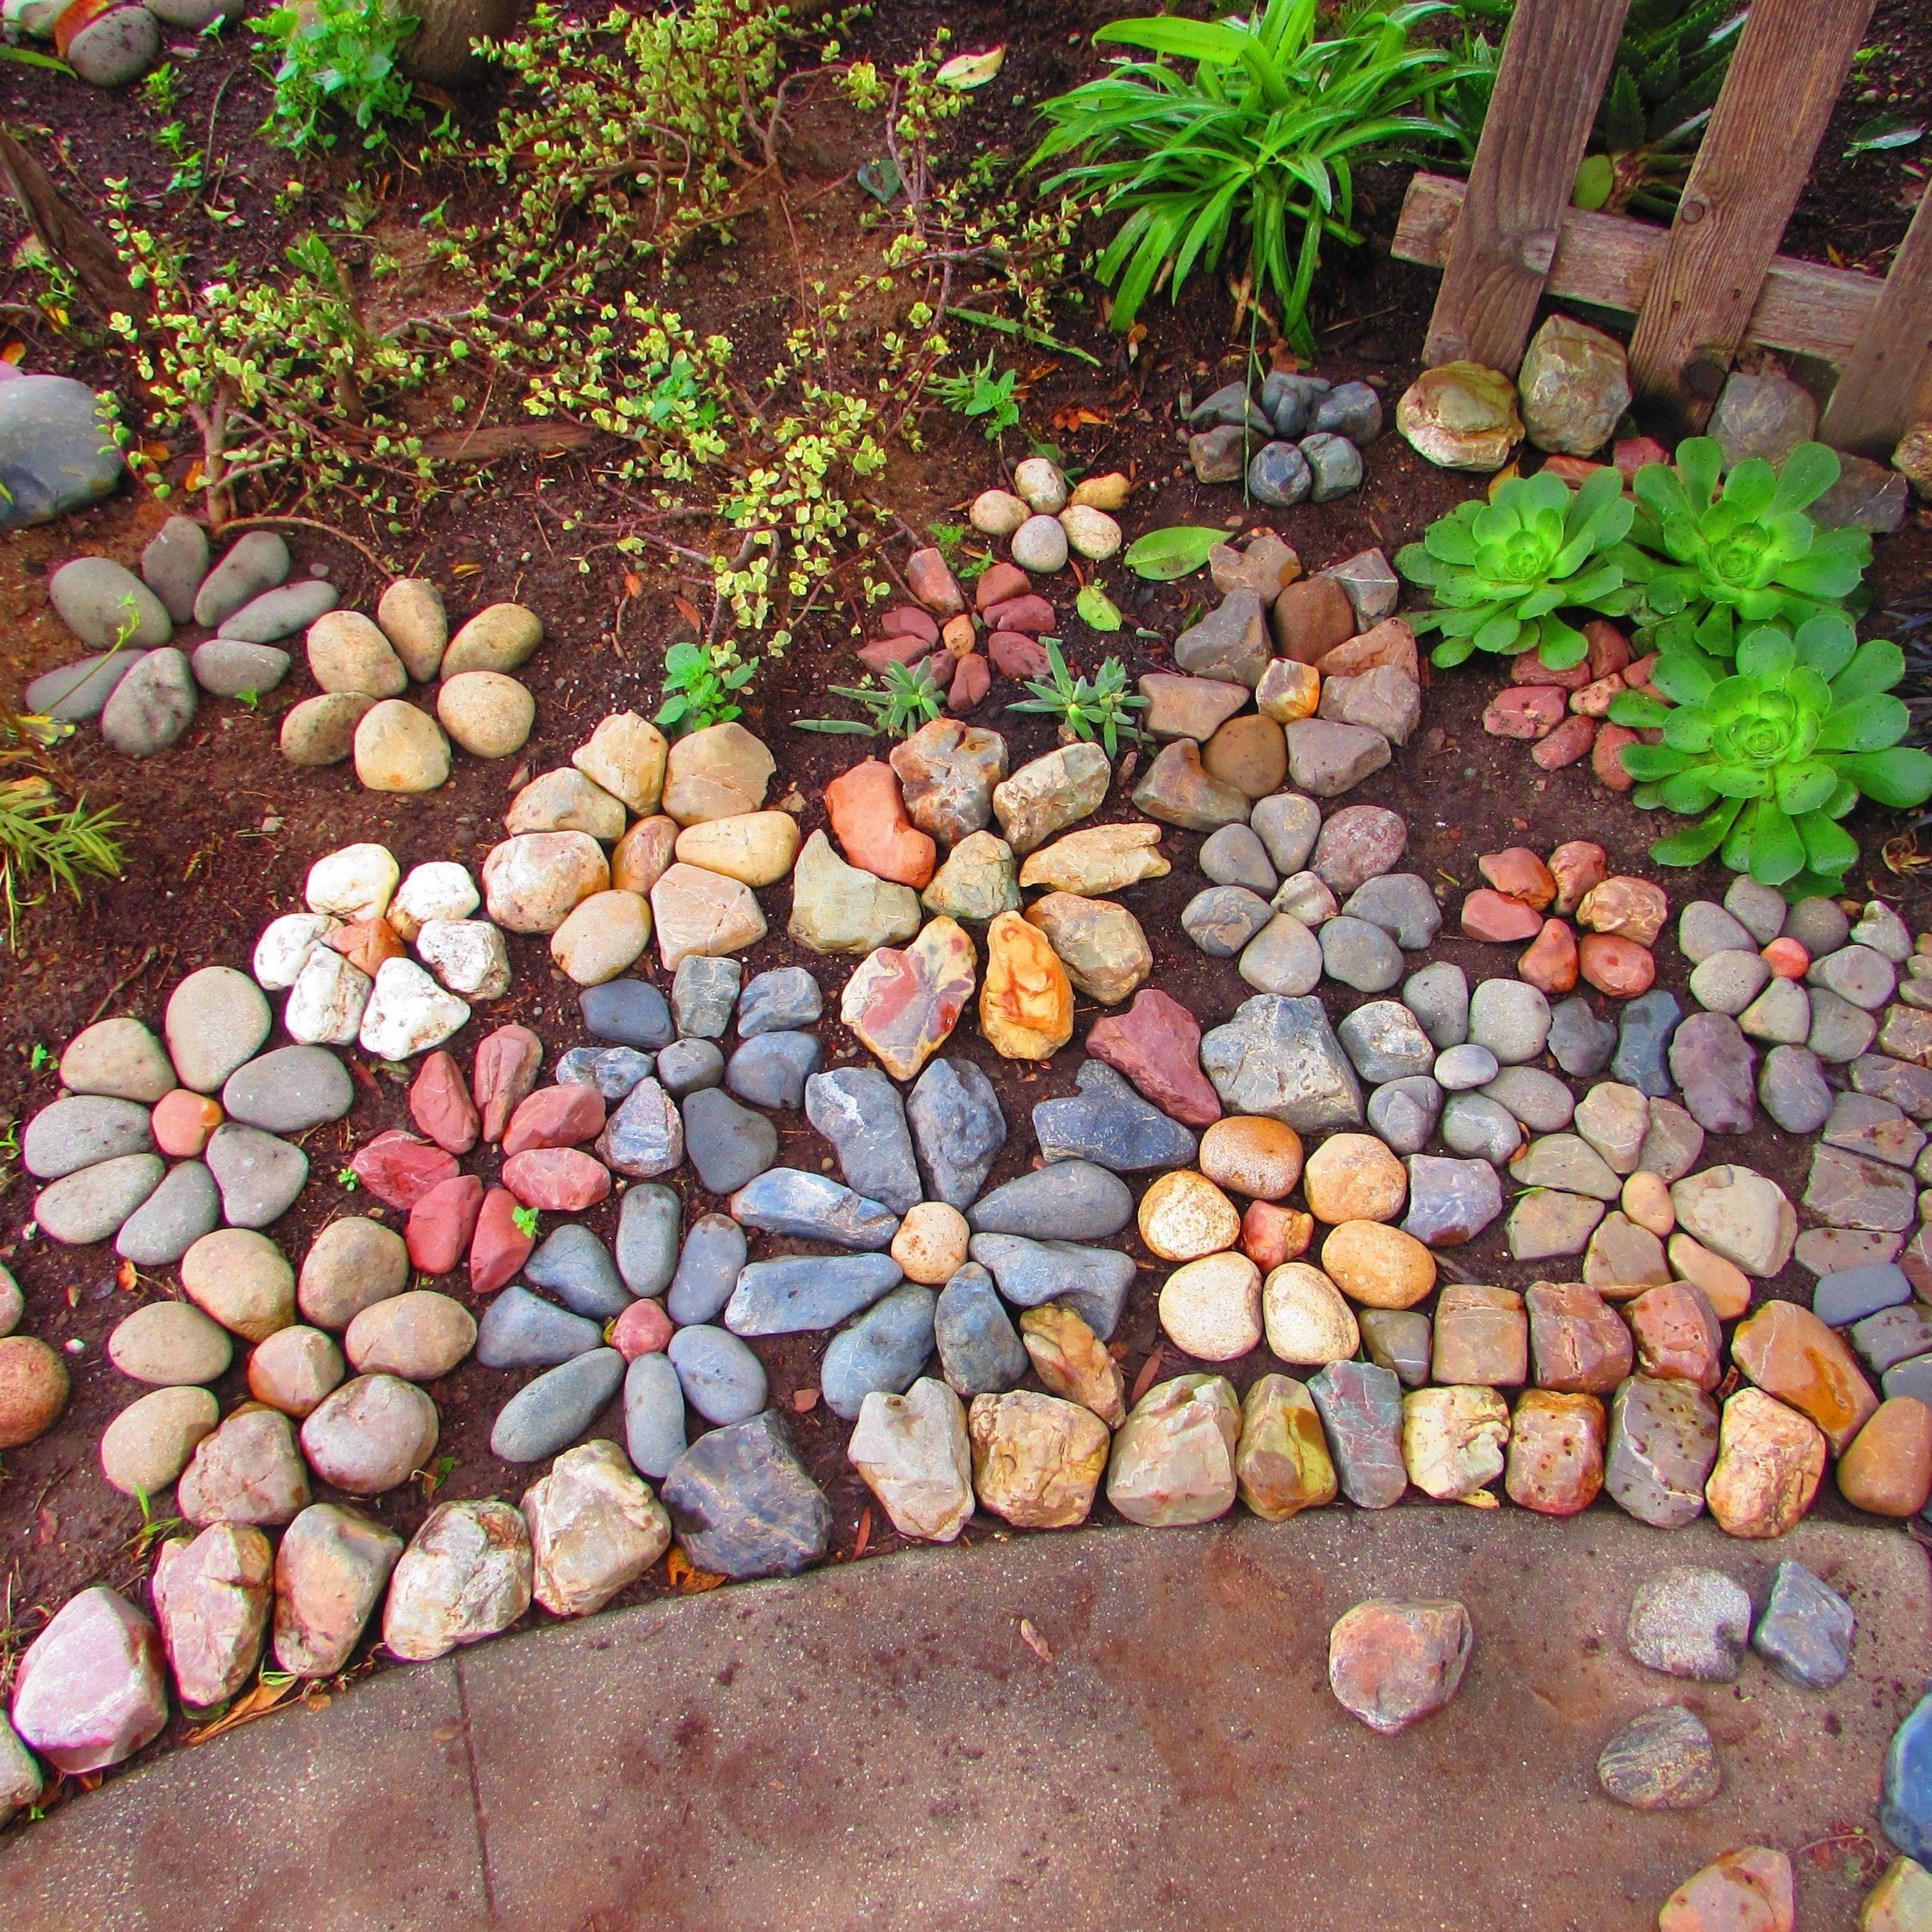 140 Simple Front Yard Landscaping Ideas But Very Interest Decrooa Com Rock Garden Landscaping Rock Garden Design Backyard Landscaping